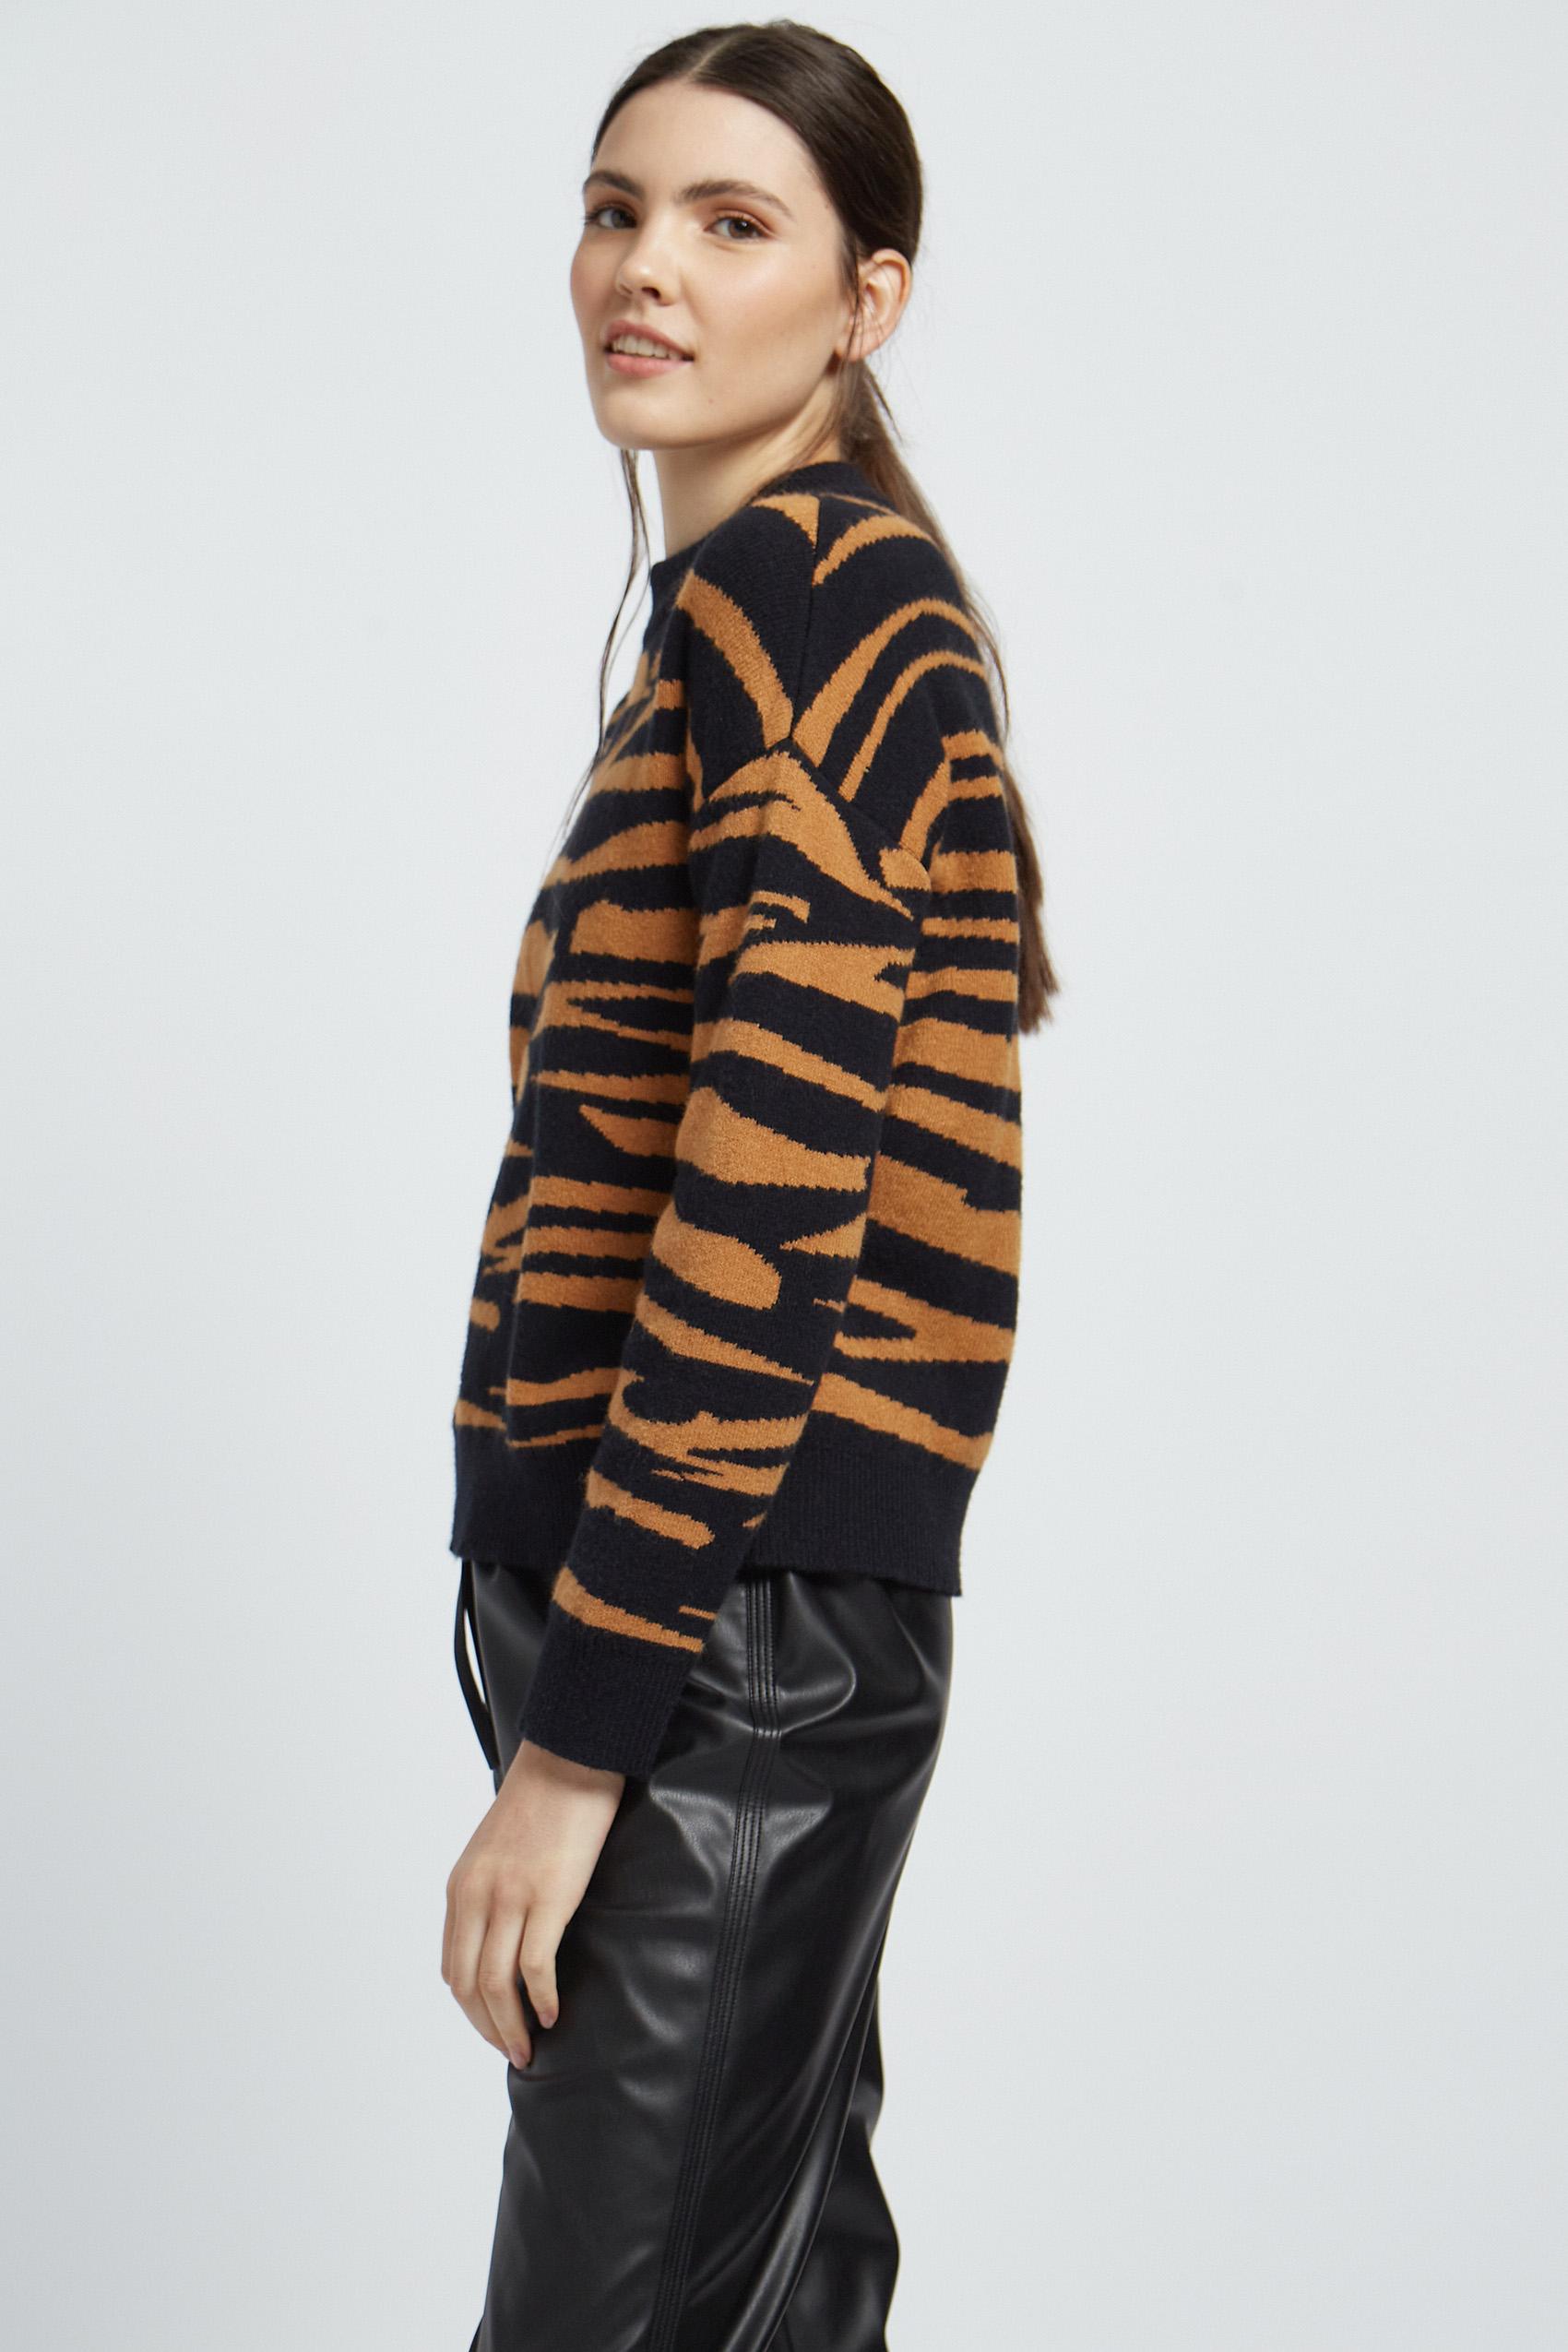 awada_sweater-zebra_47-06-2021__picture-22285